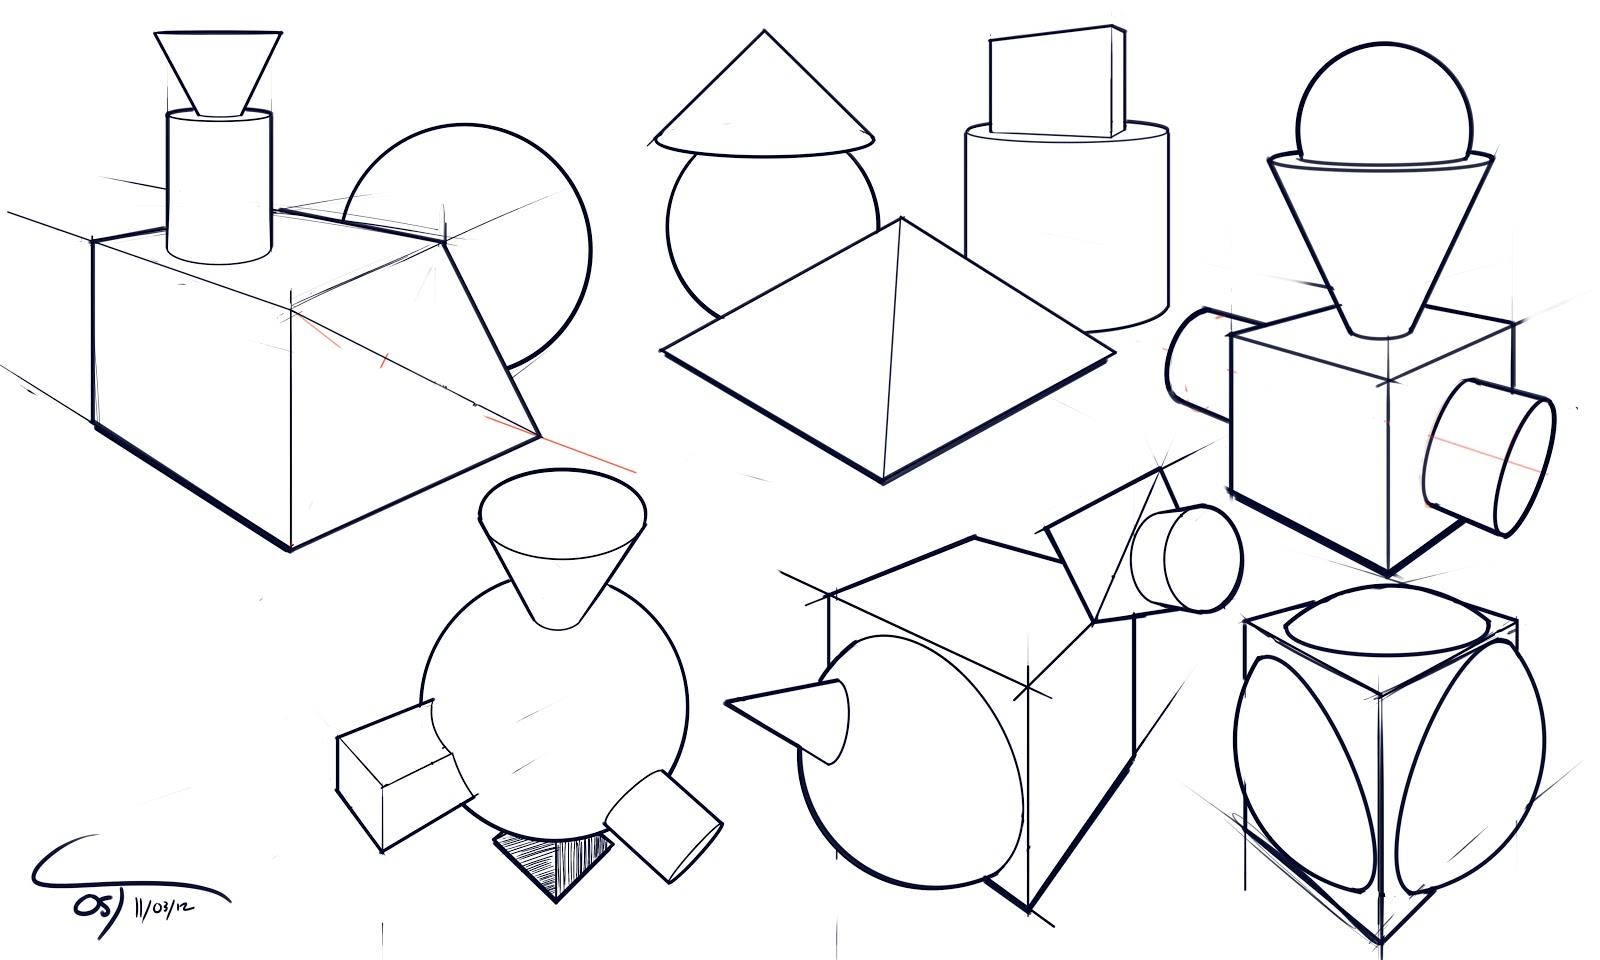 Simple Shapes Drawing At Getdrawings